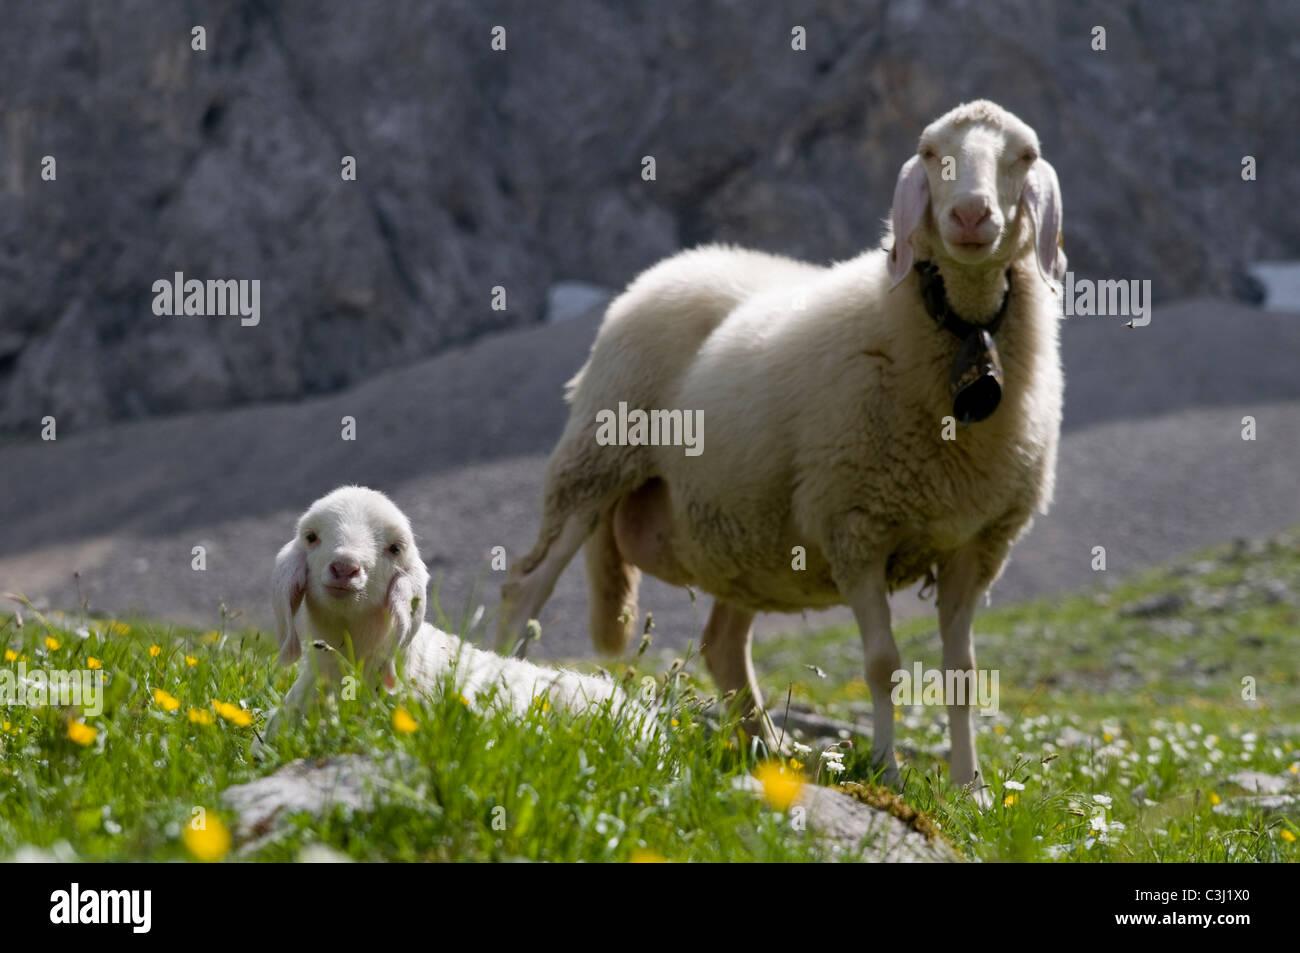 Lamm Stock Photos & Lamm Stock Images - Alamy